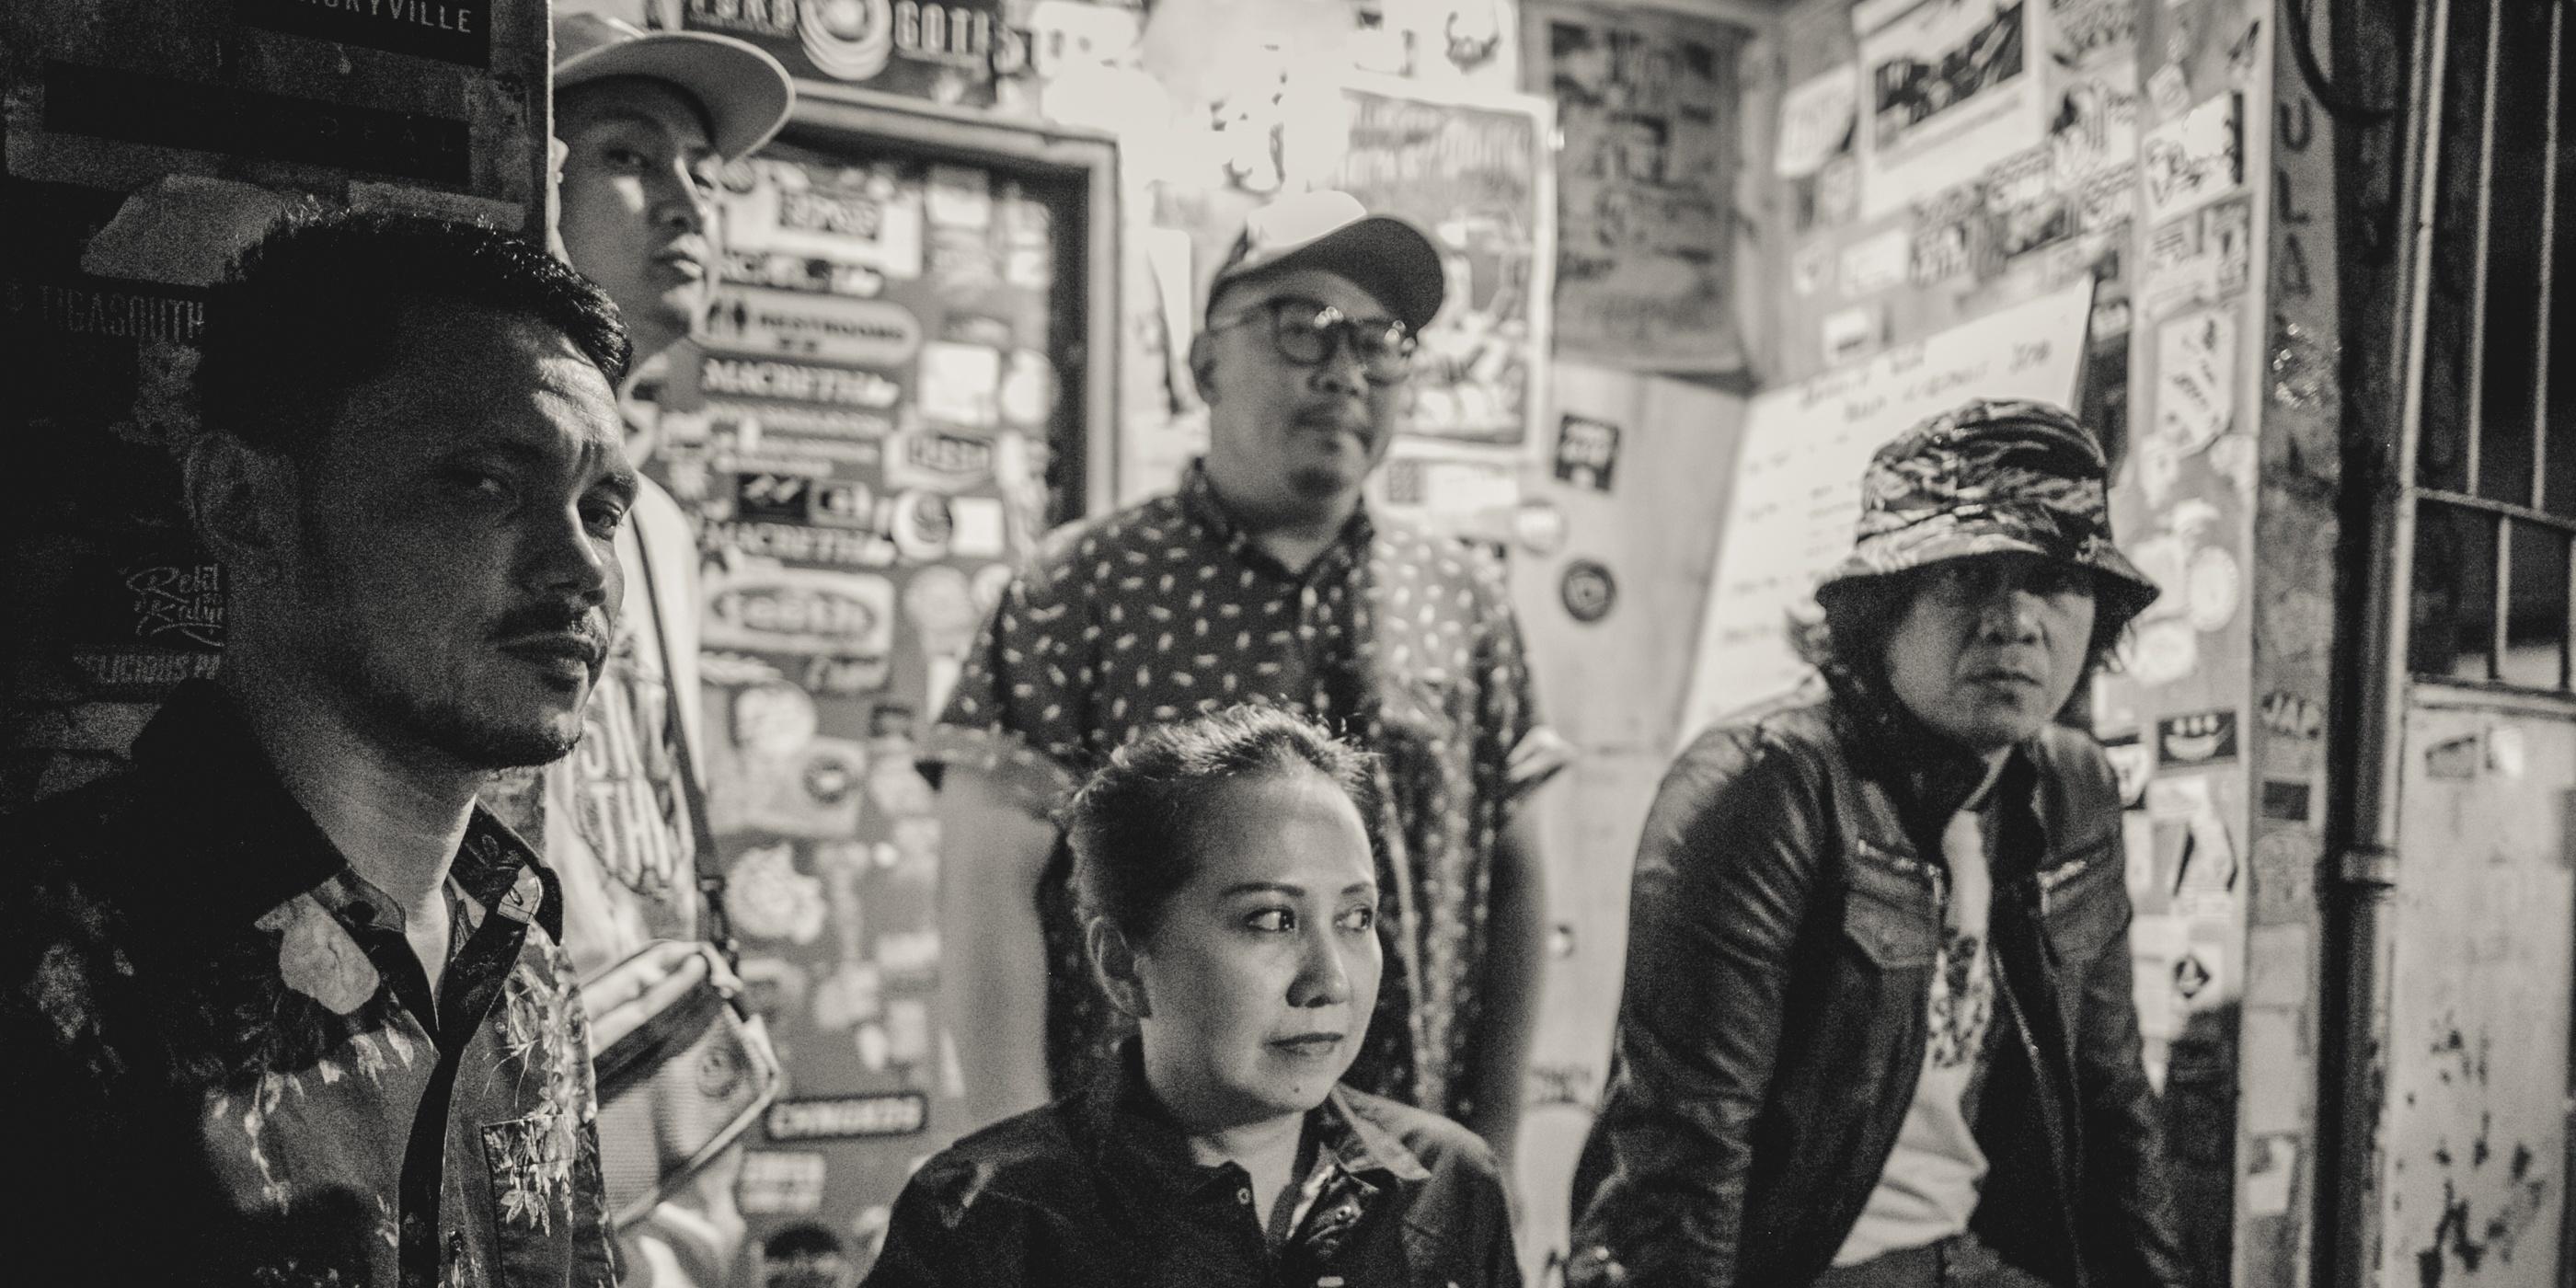 Sandwich take on Manila traffic woes in new single, 'Buhol Buhol' – watch